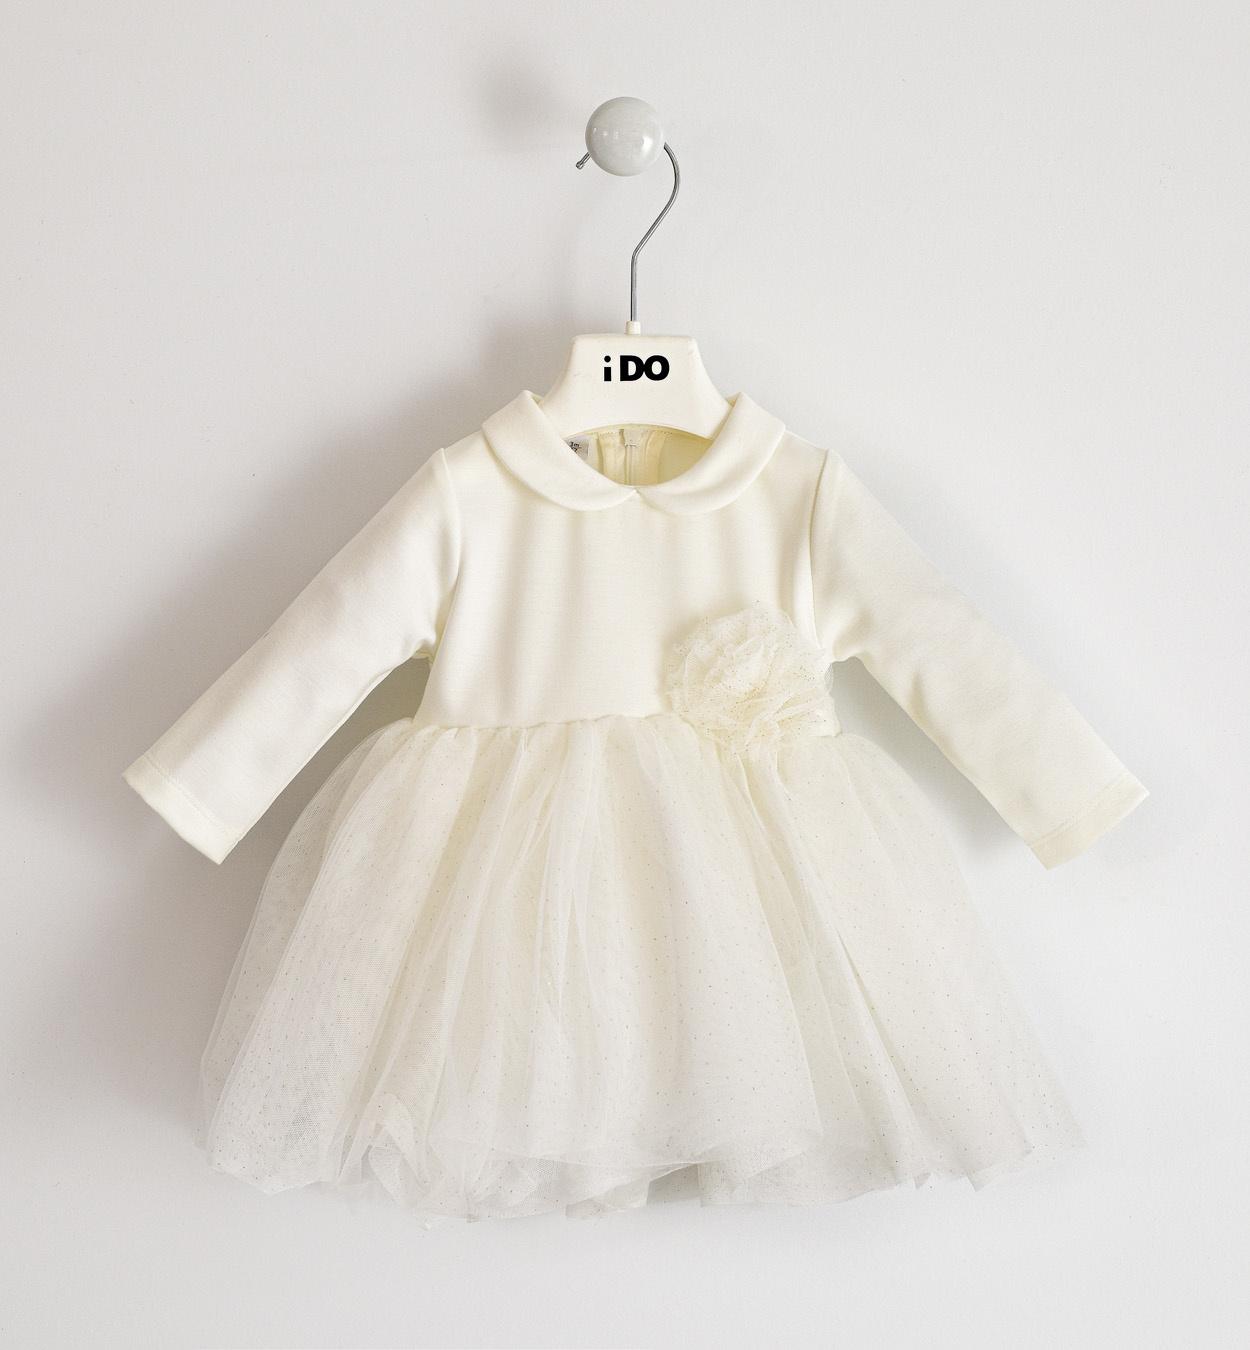 Ido Ido 1251 Winter White Sparkle Dress